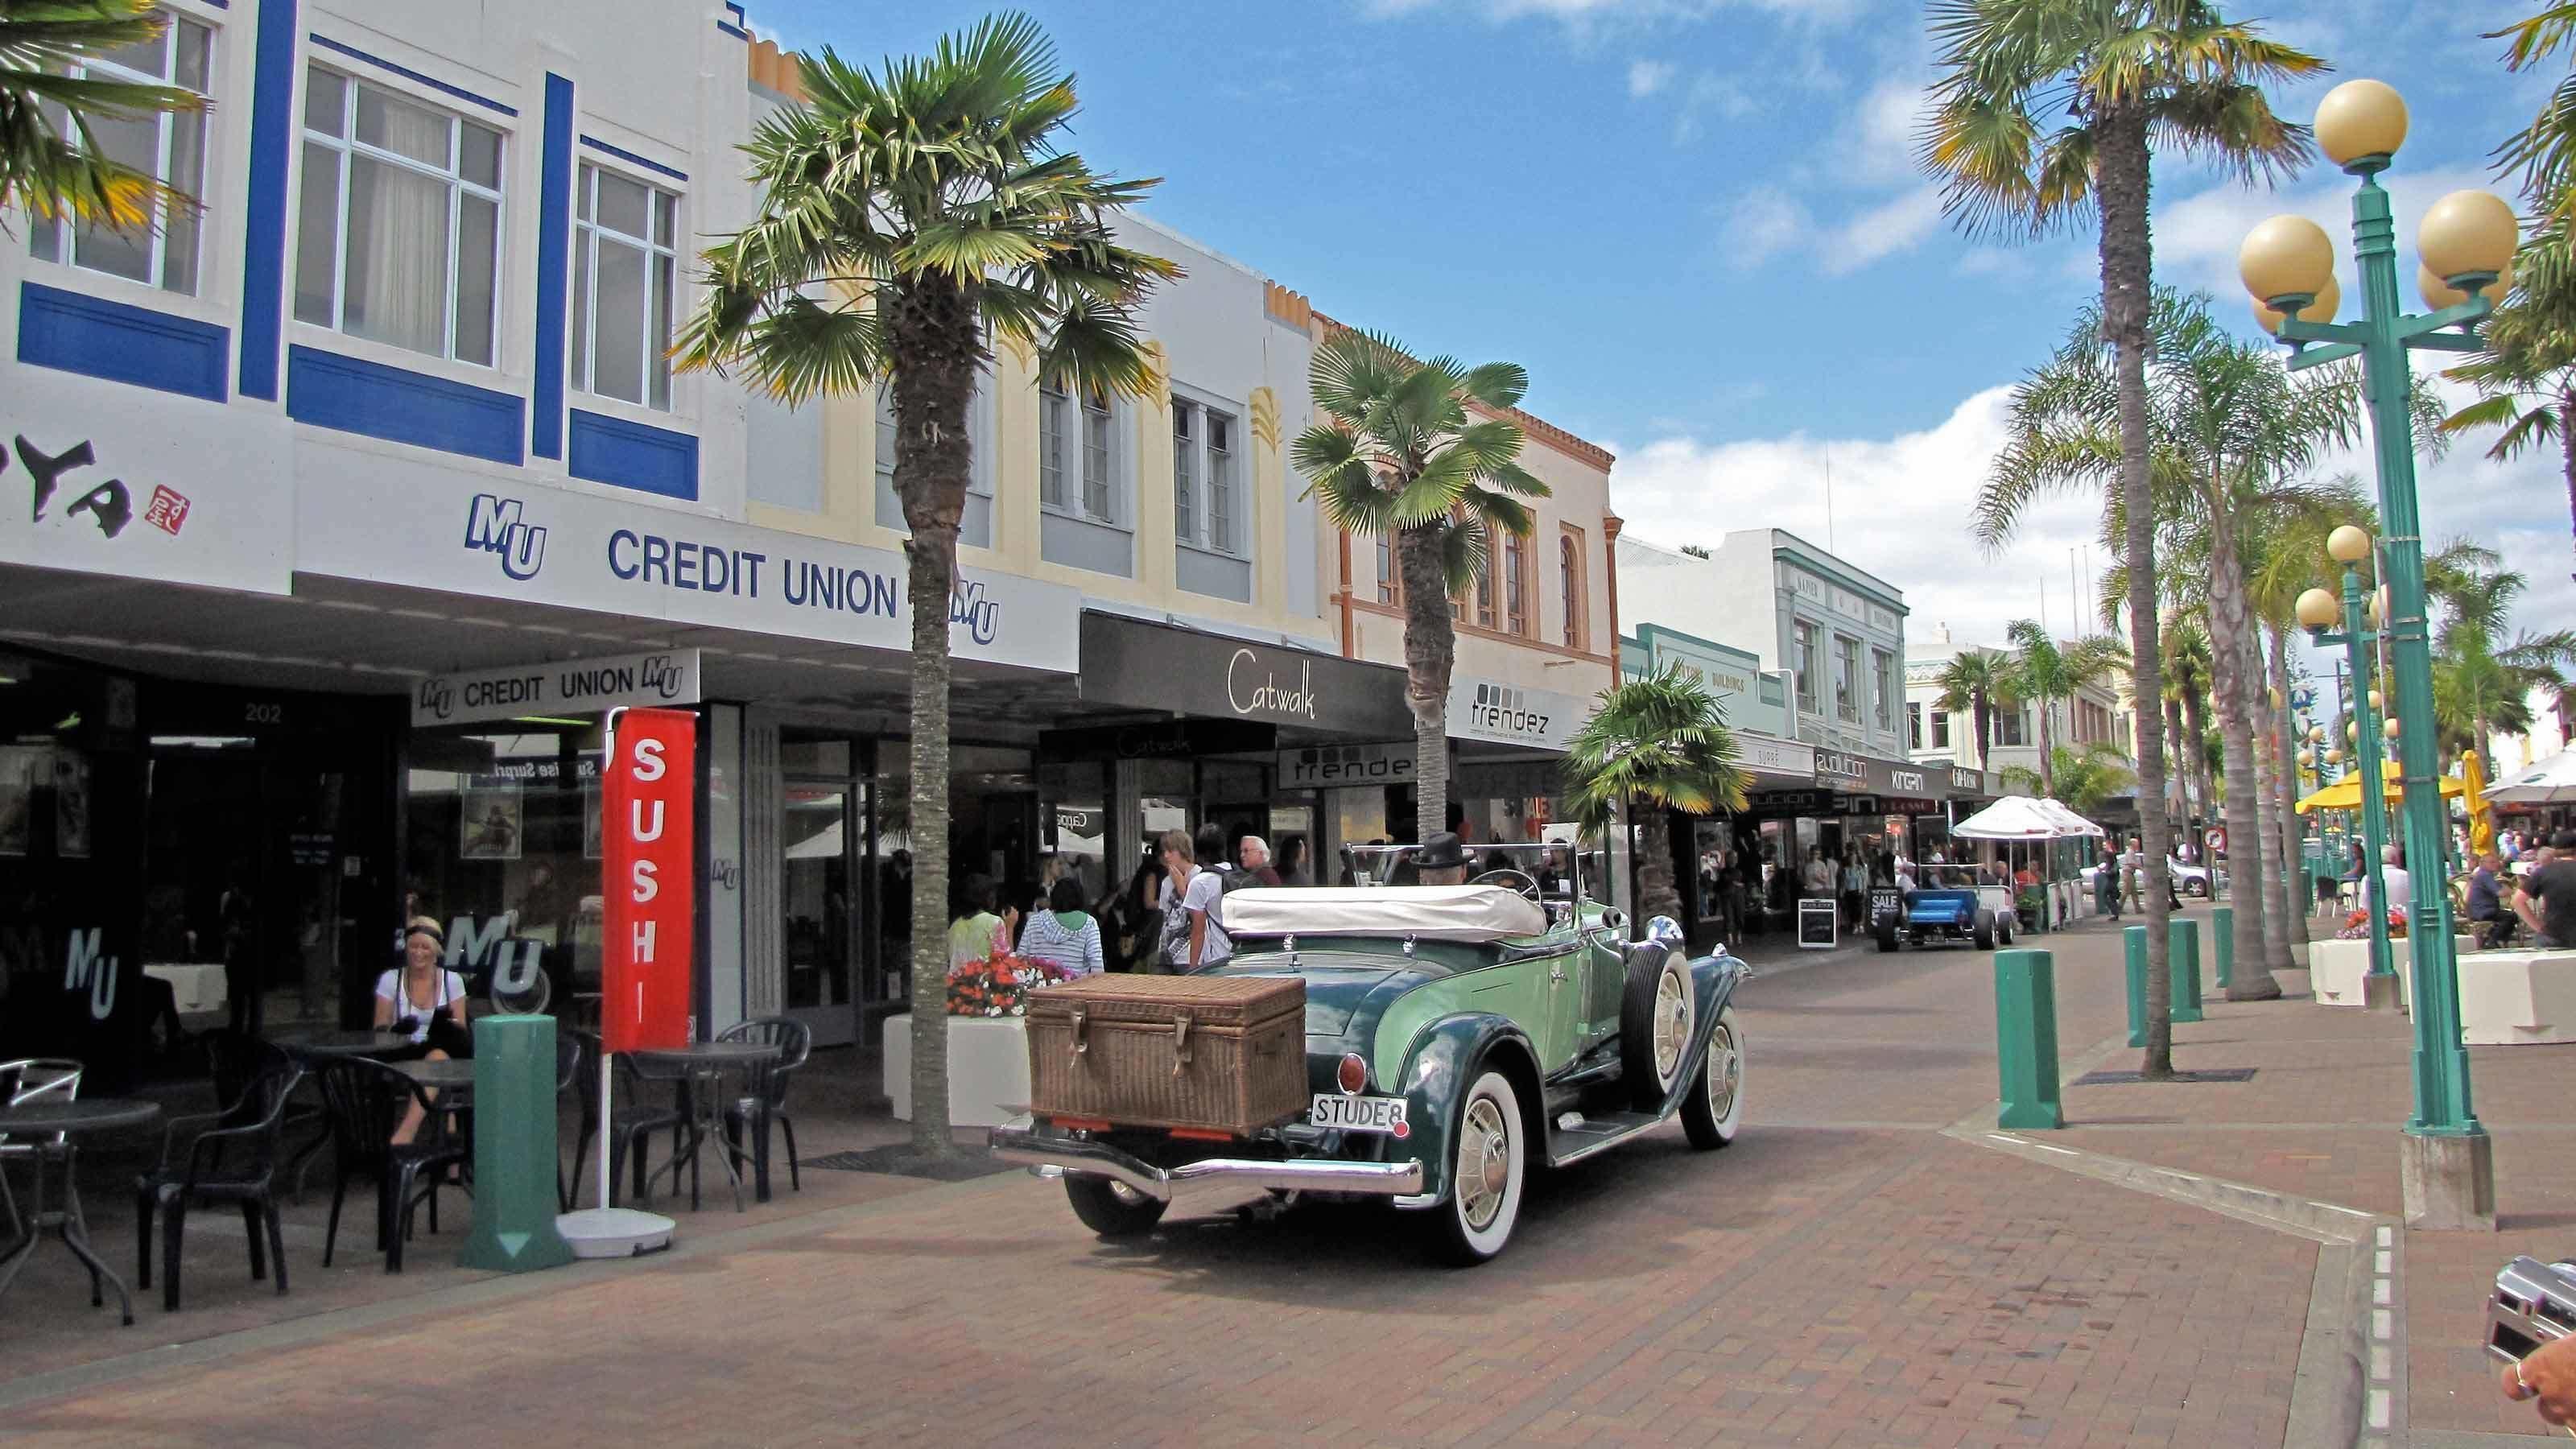 Napier Cruise Excursion – City Sights & Hawke's Bay Tour